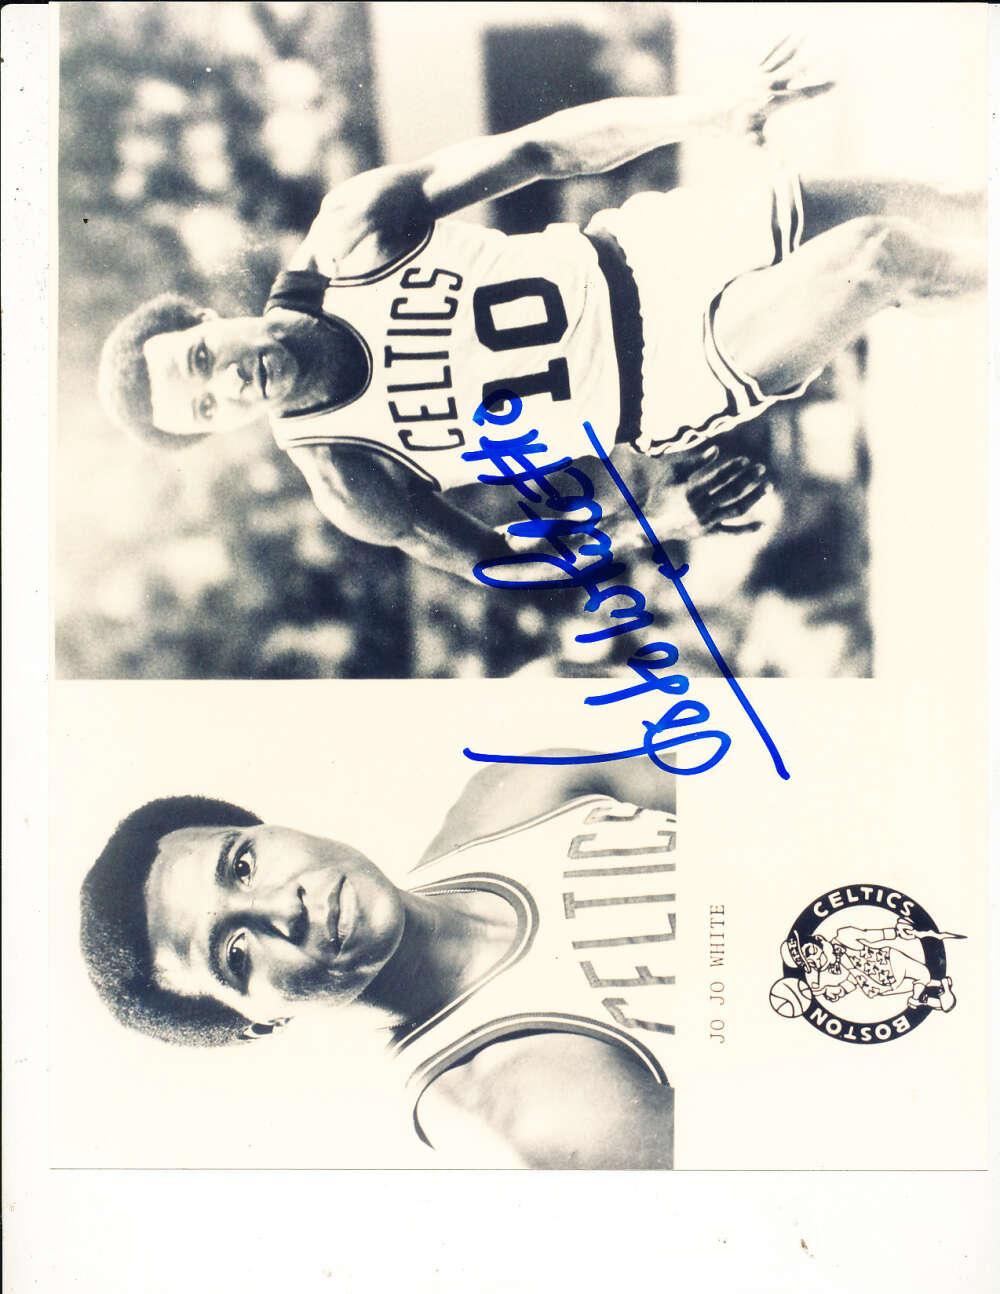 Jo Jo White Boston Celtics signed 8x10 photo